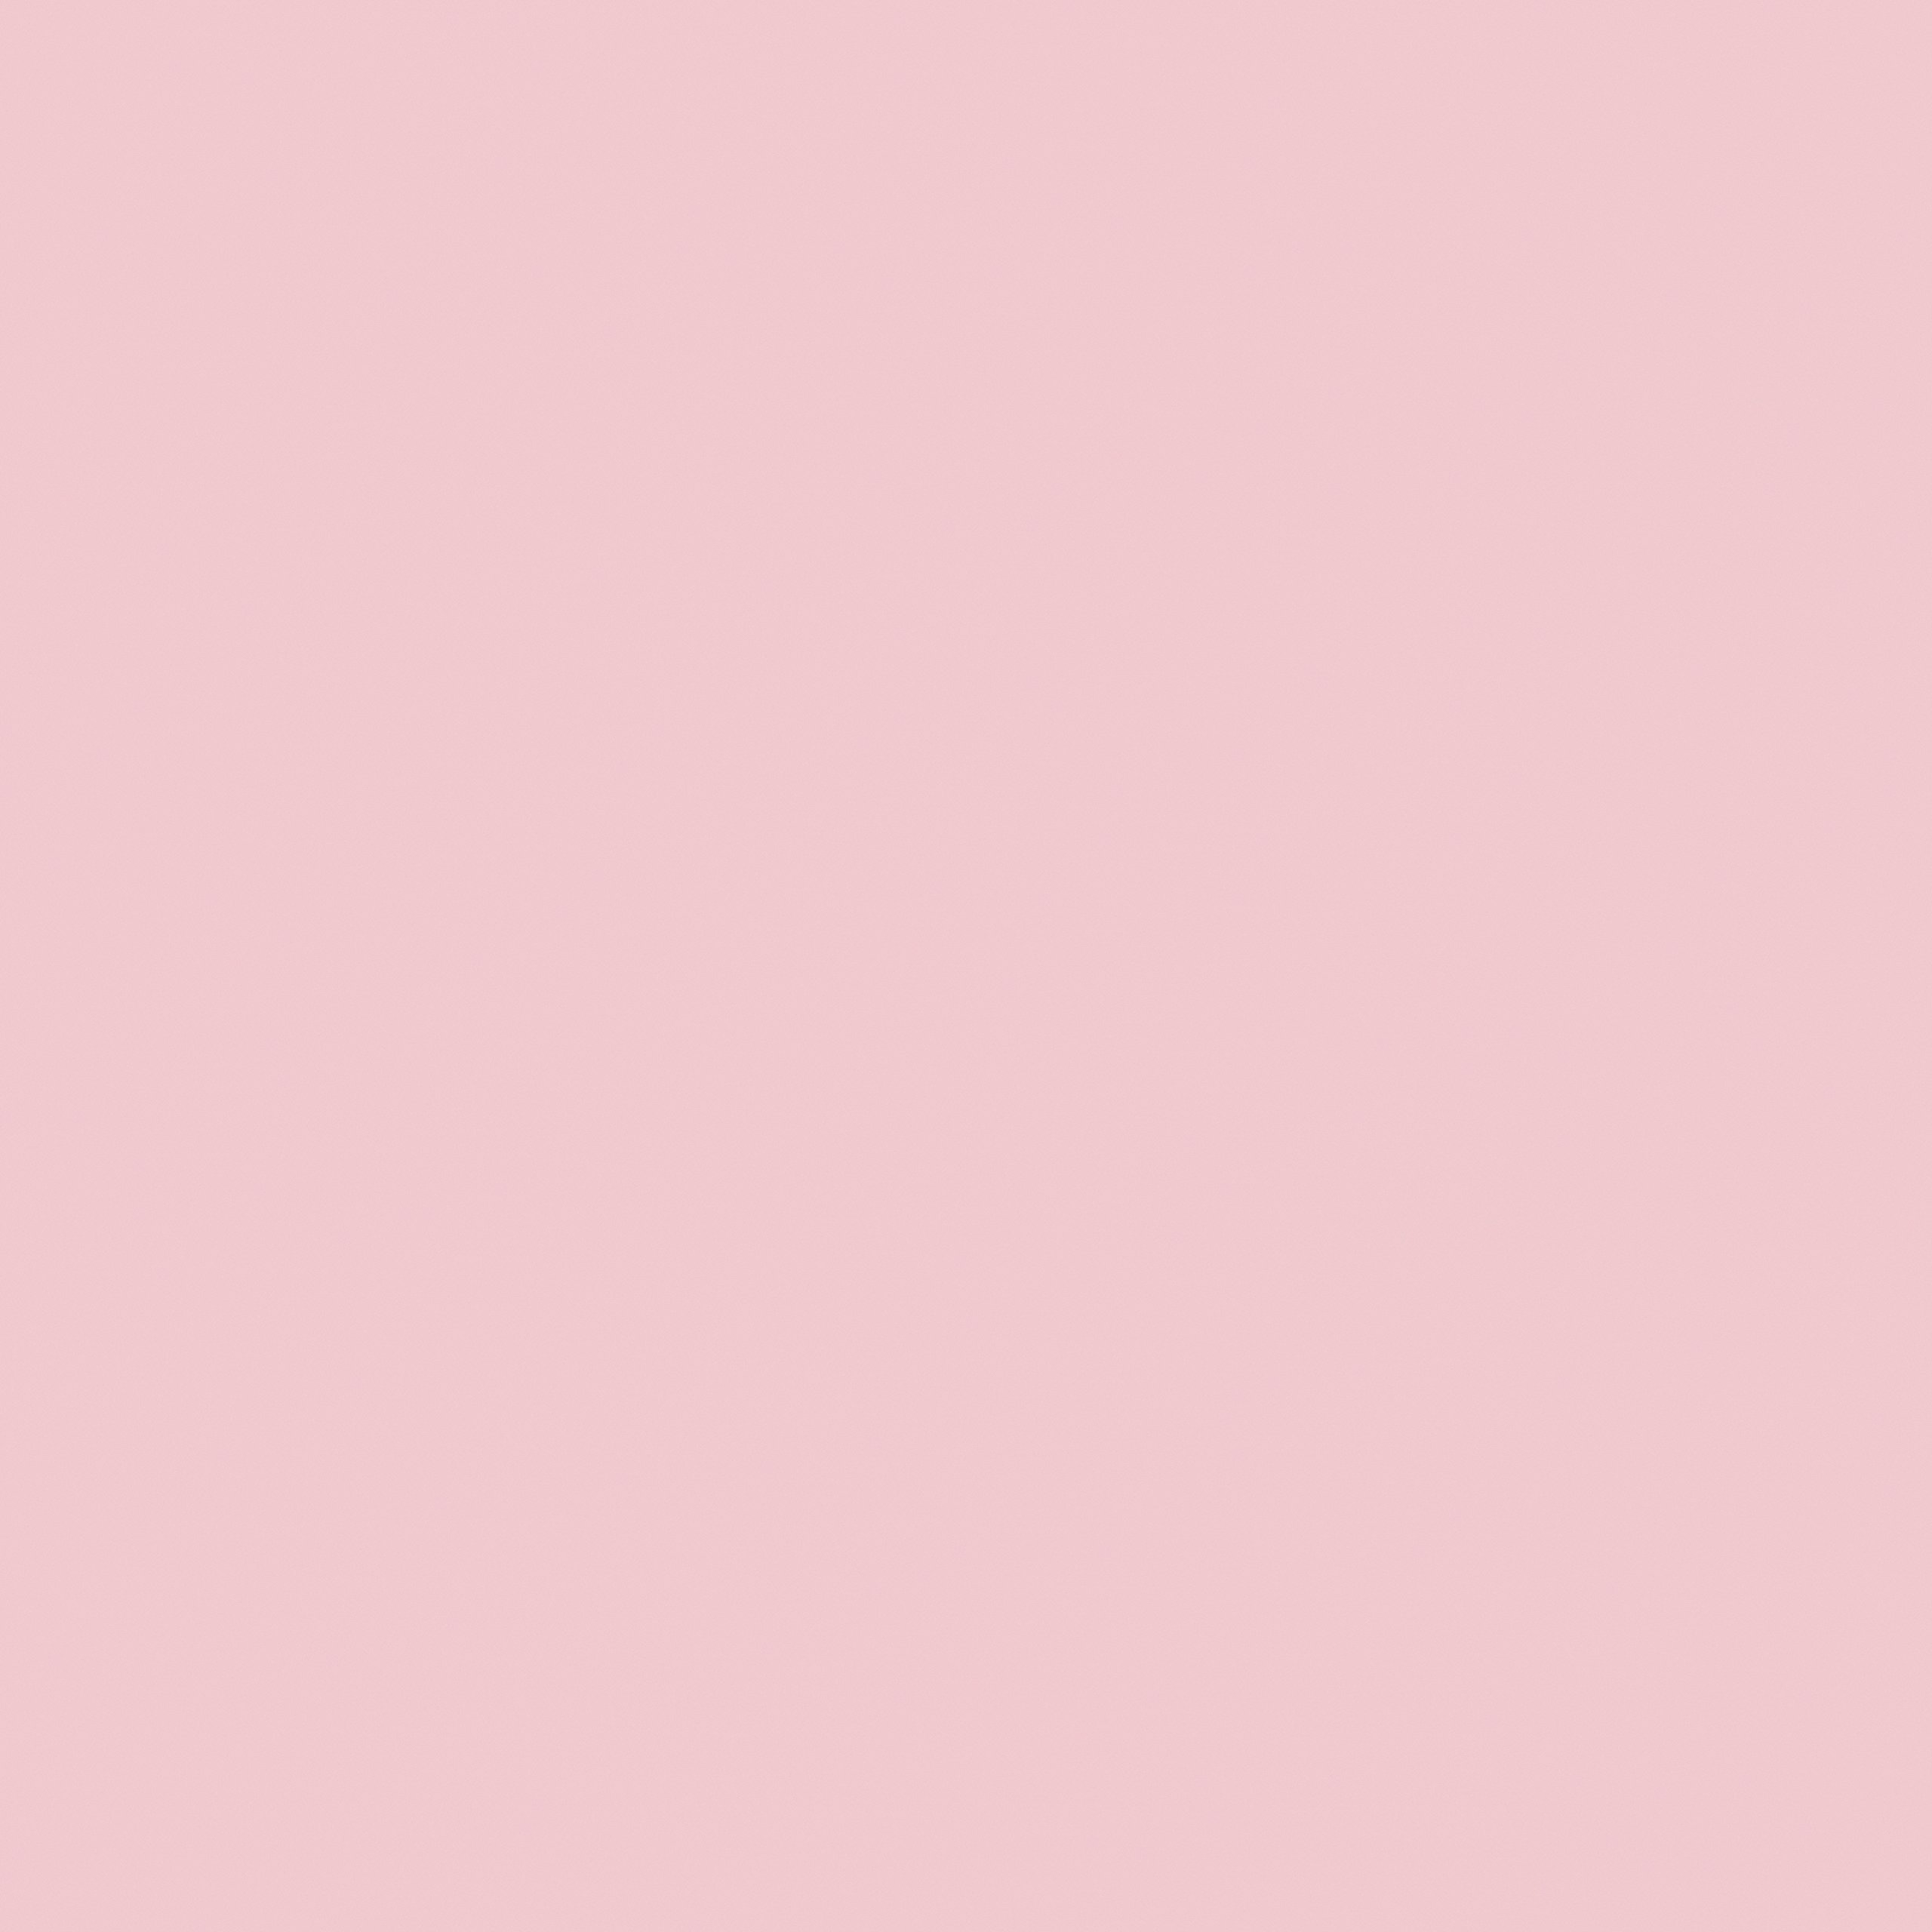 Adhesive Film Plain Matt Powder Pink Decorative Stickers Furniture Foil Wallpaper Self Adhesive Foil